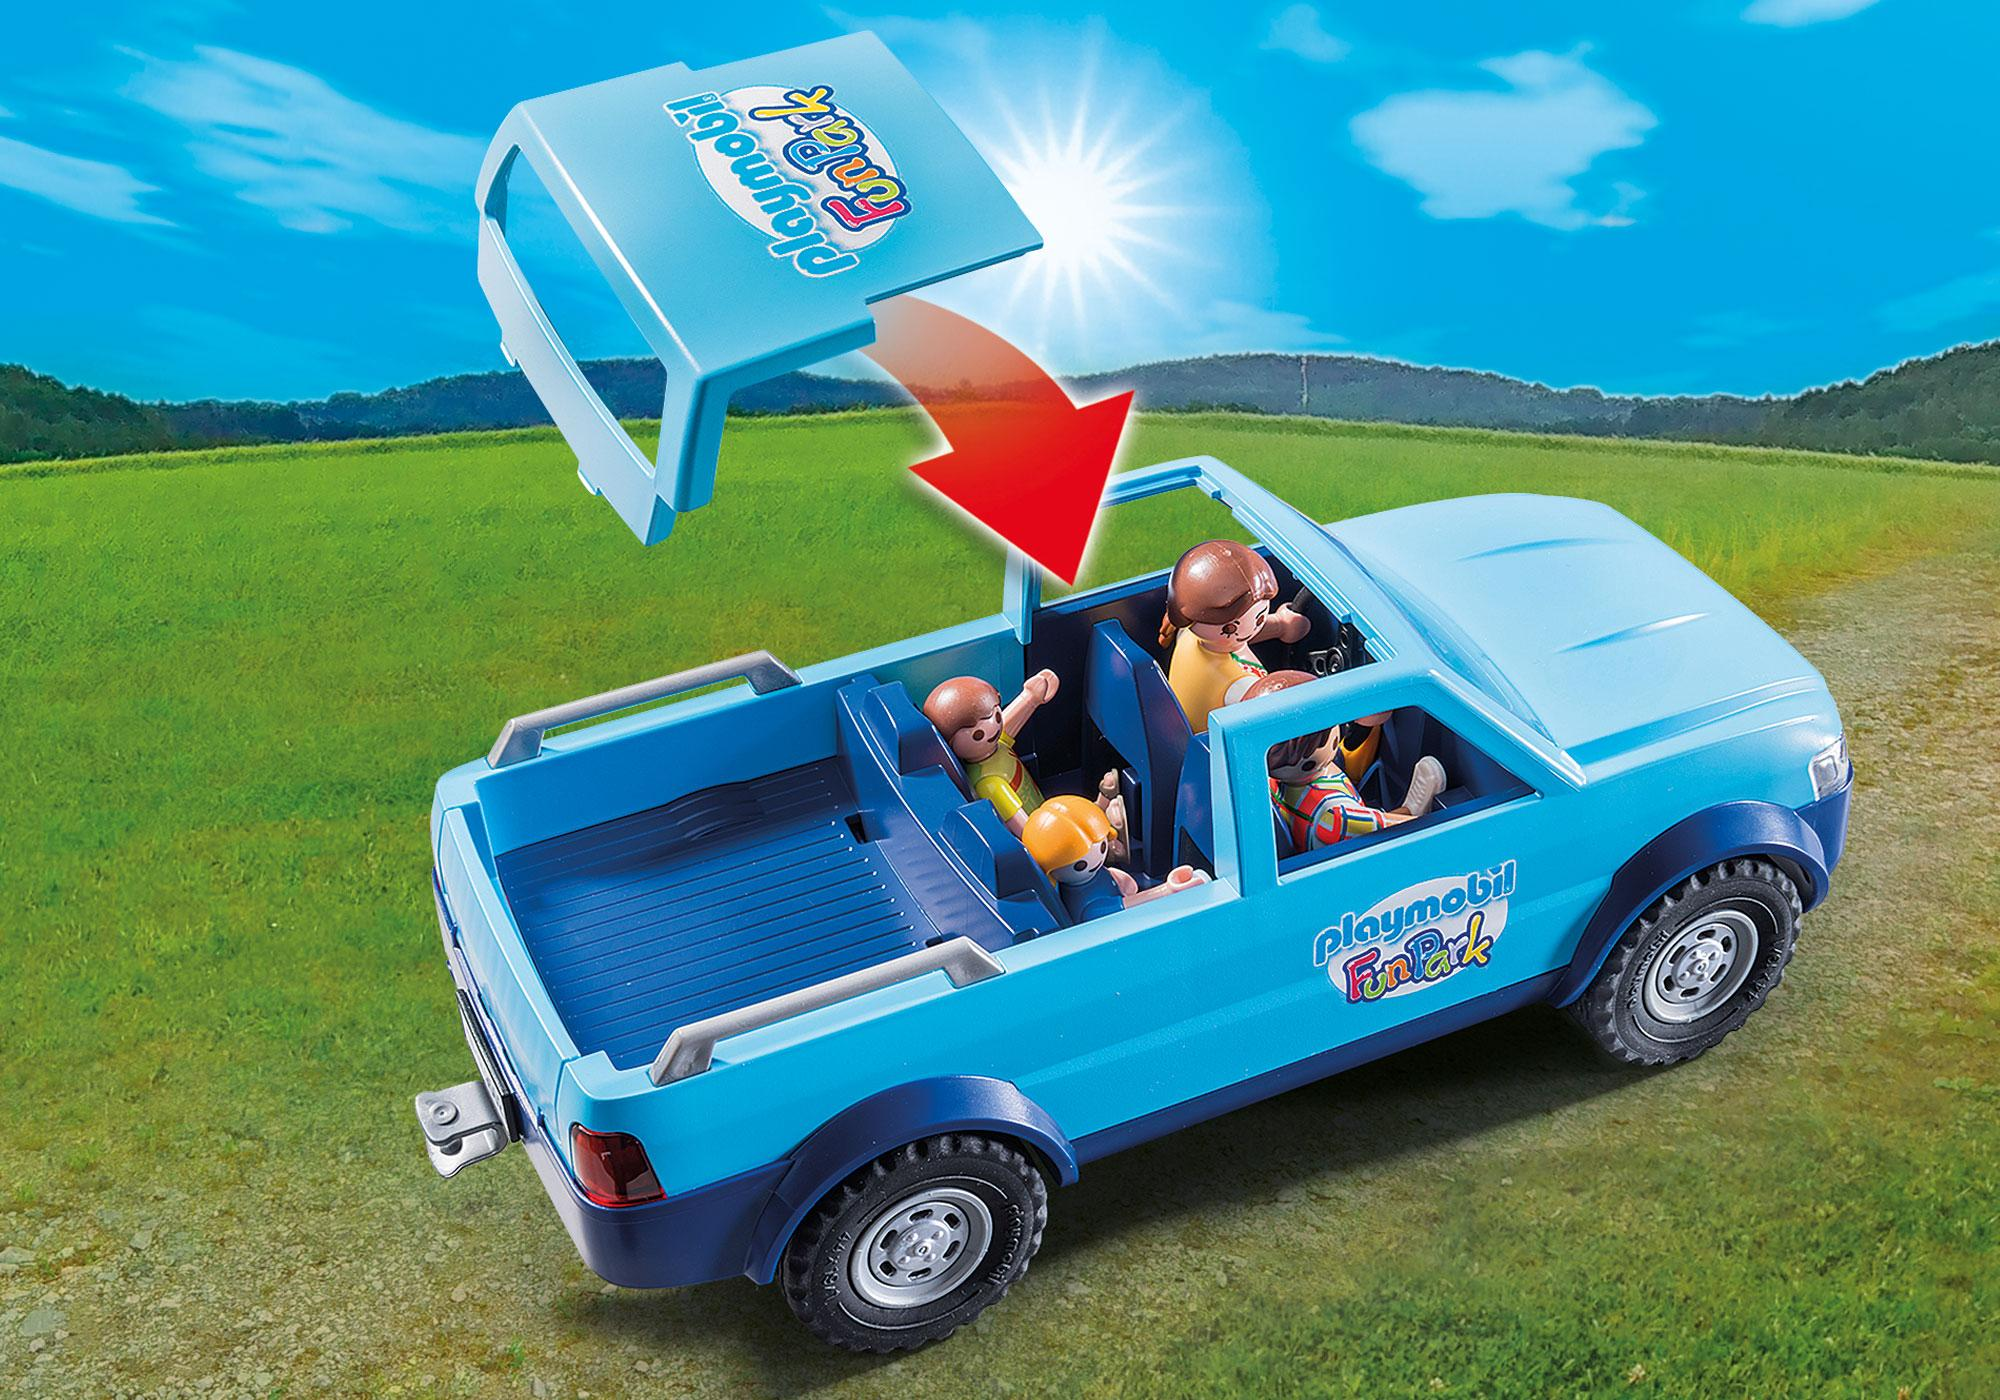 http://media.playmobil.com/i/playmobil/9502_product_extra1/PLAYMOBIL-FunPark pickup med campingvogn